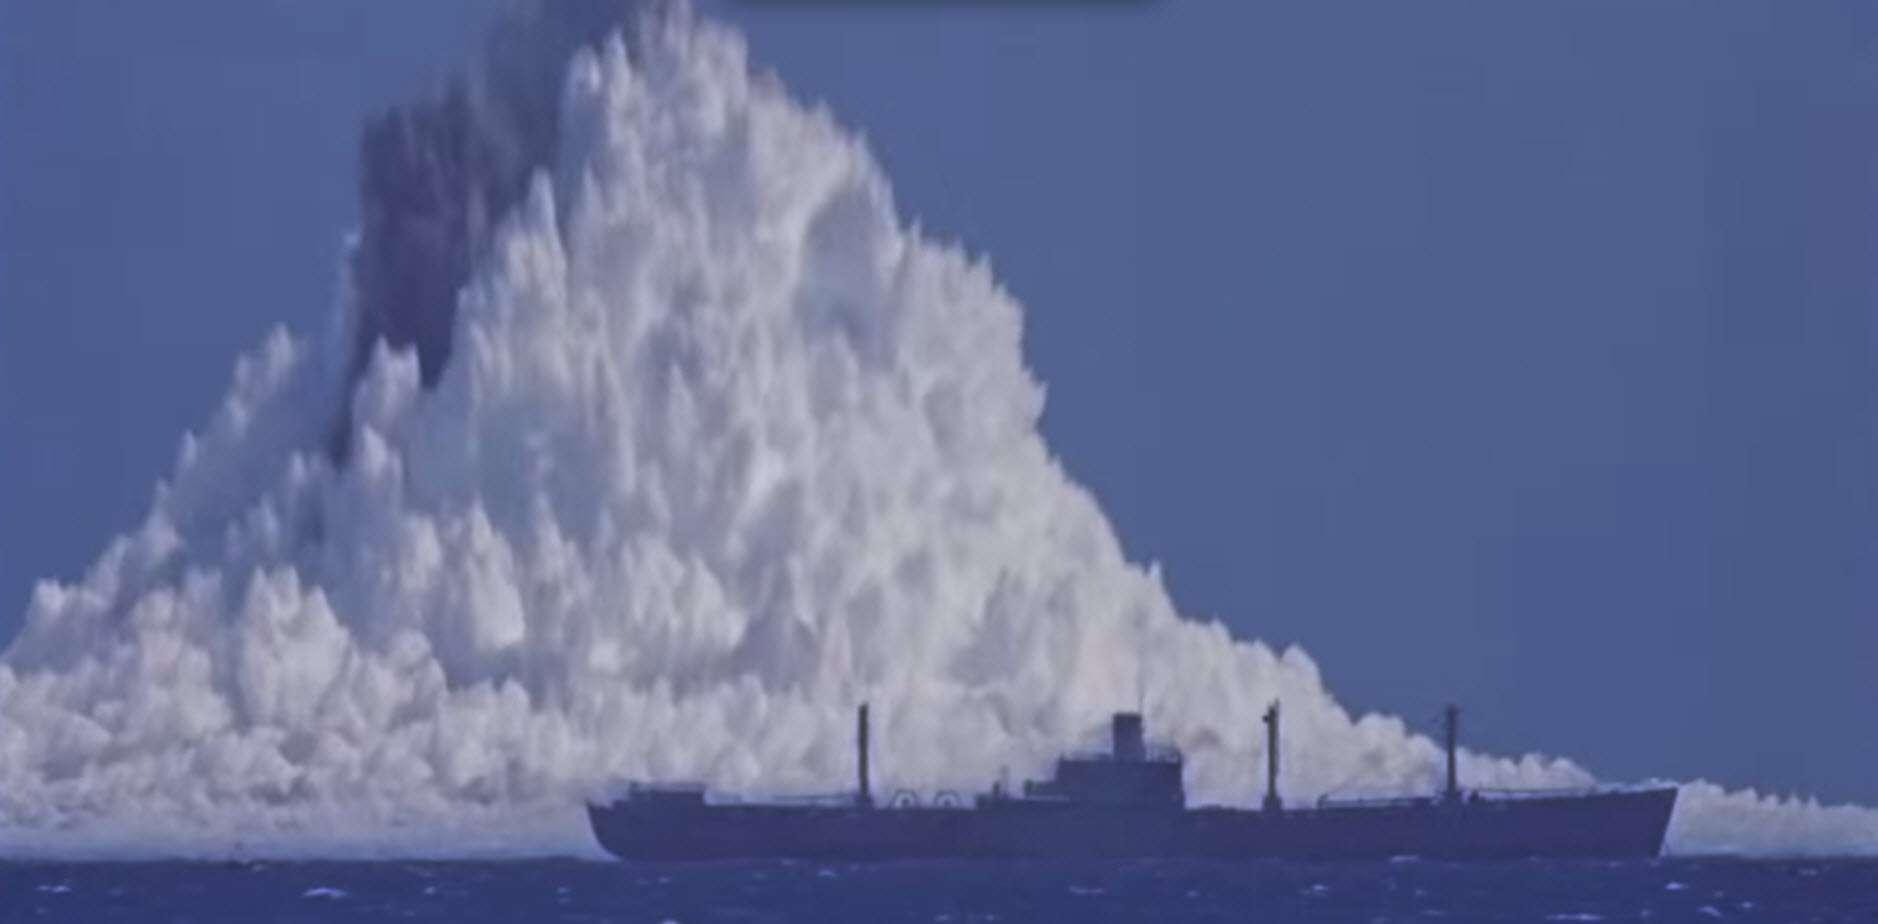 Underwater Nuke